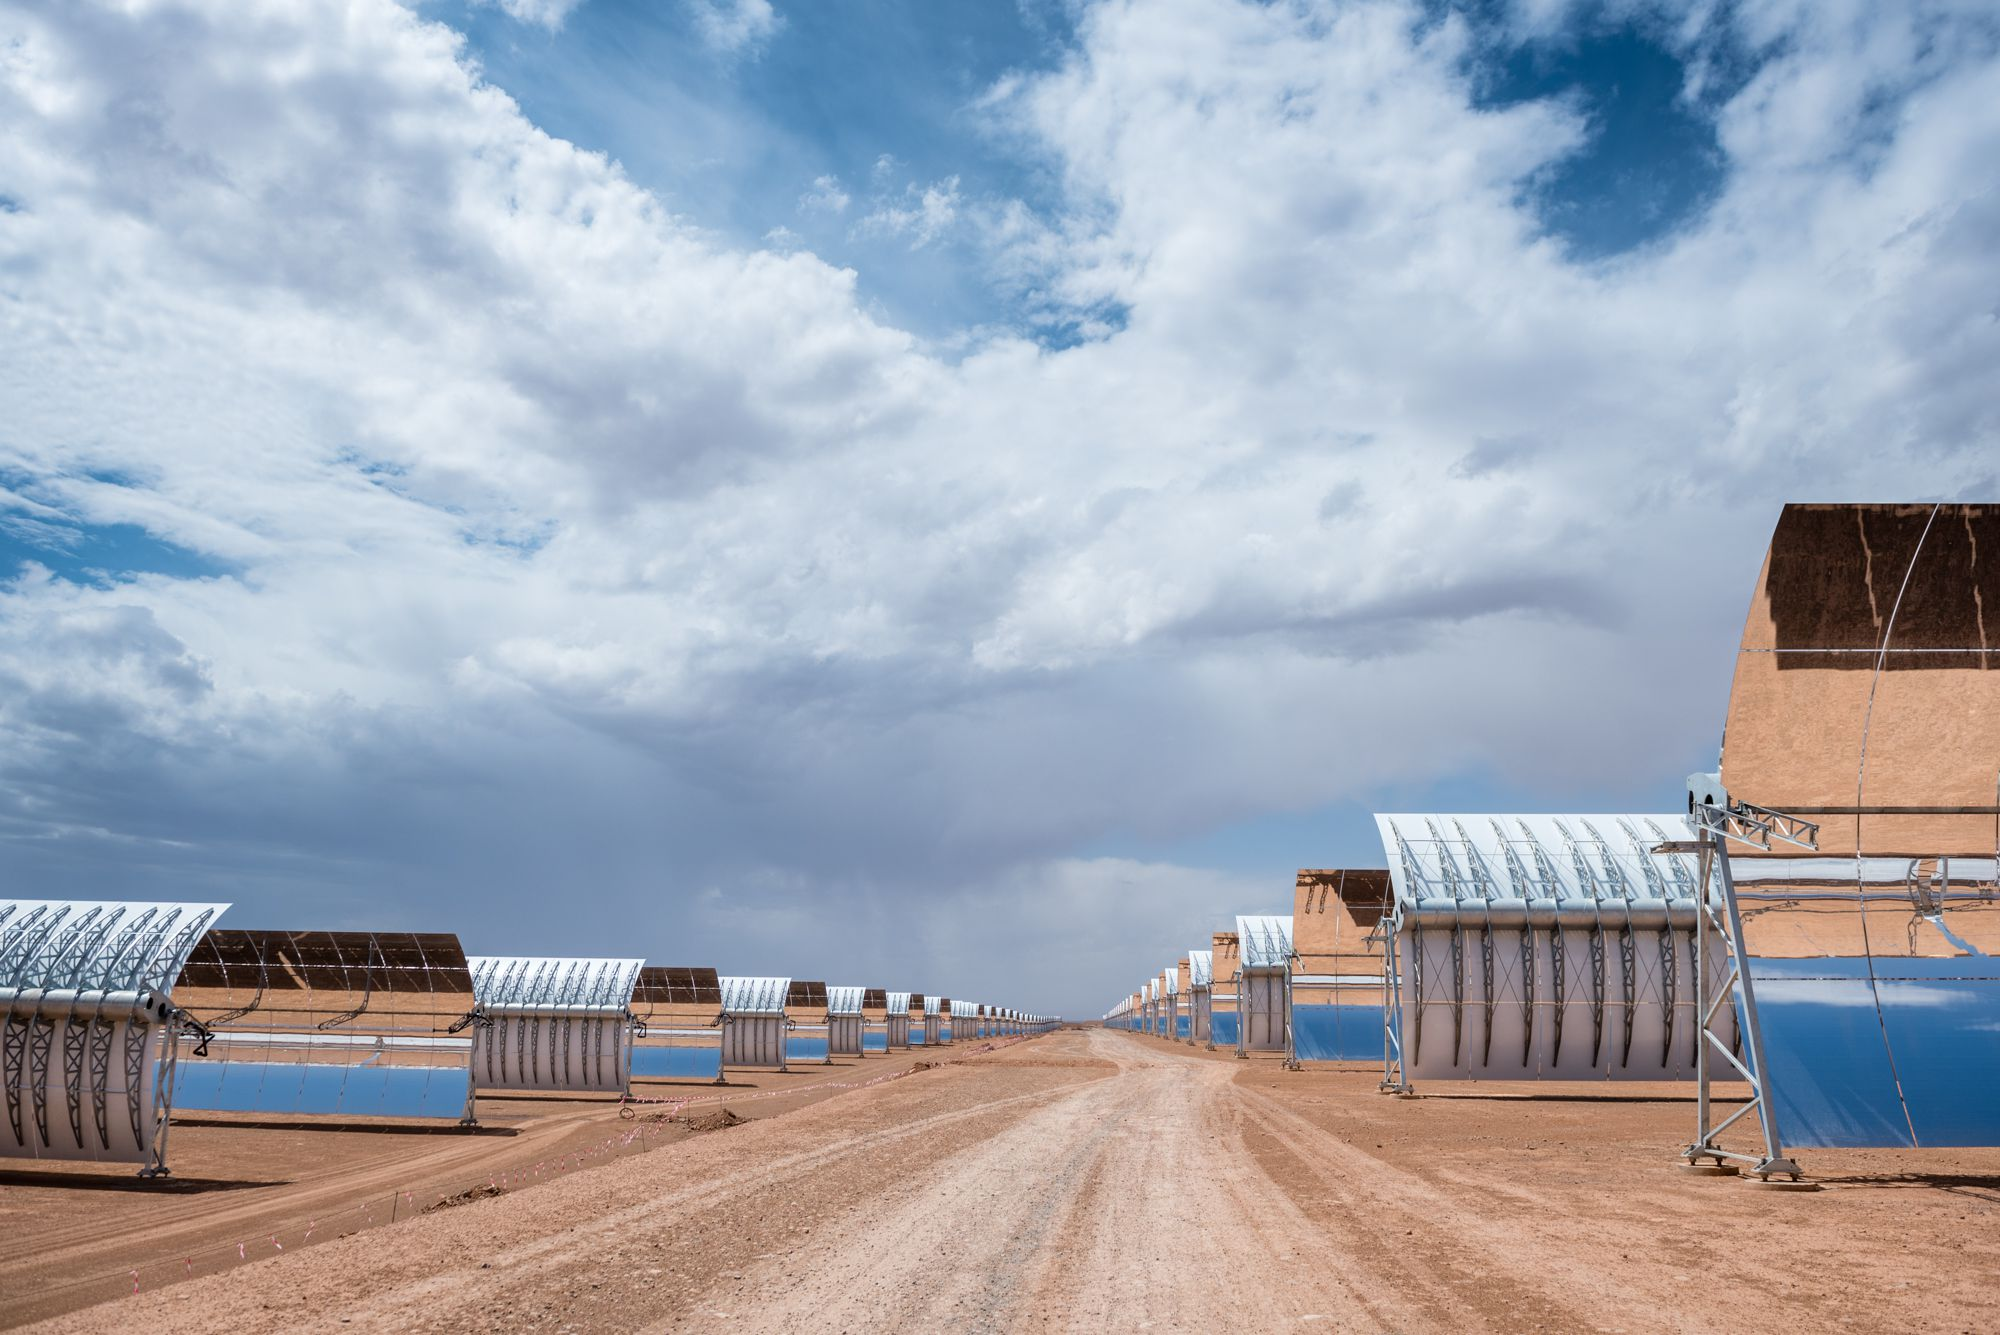 Construction of solar power station